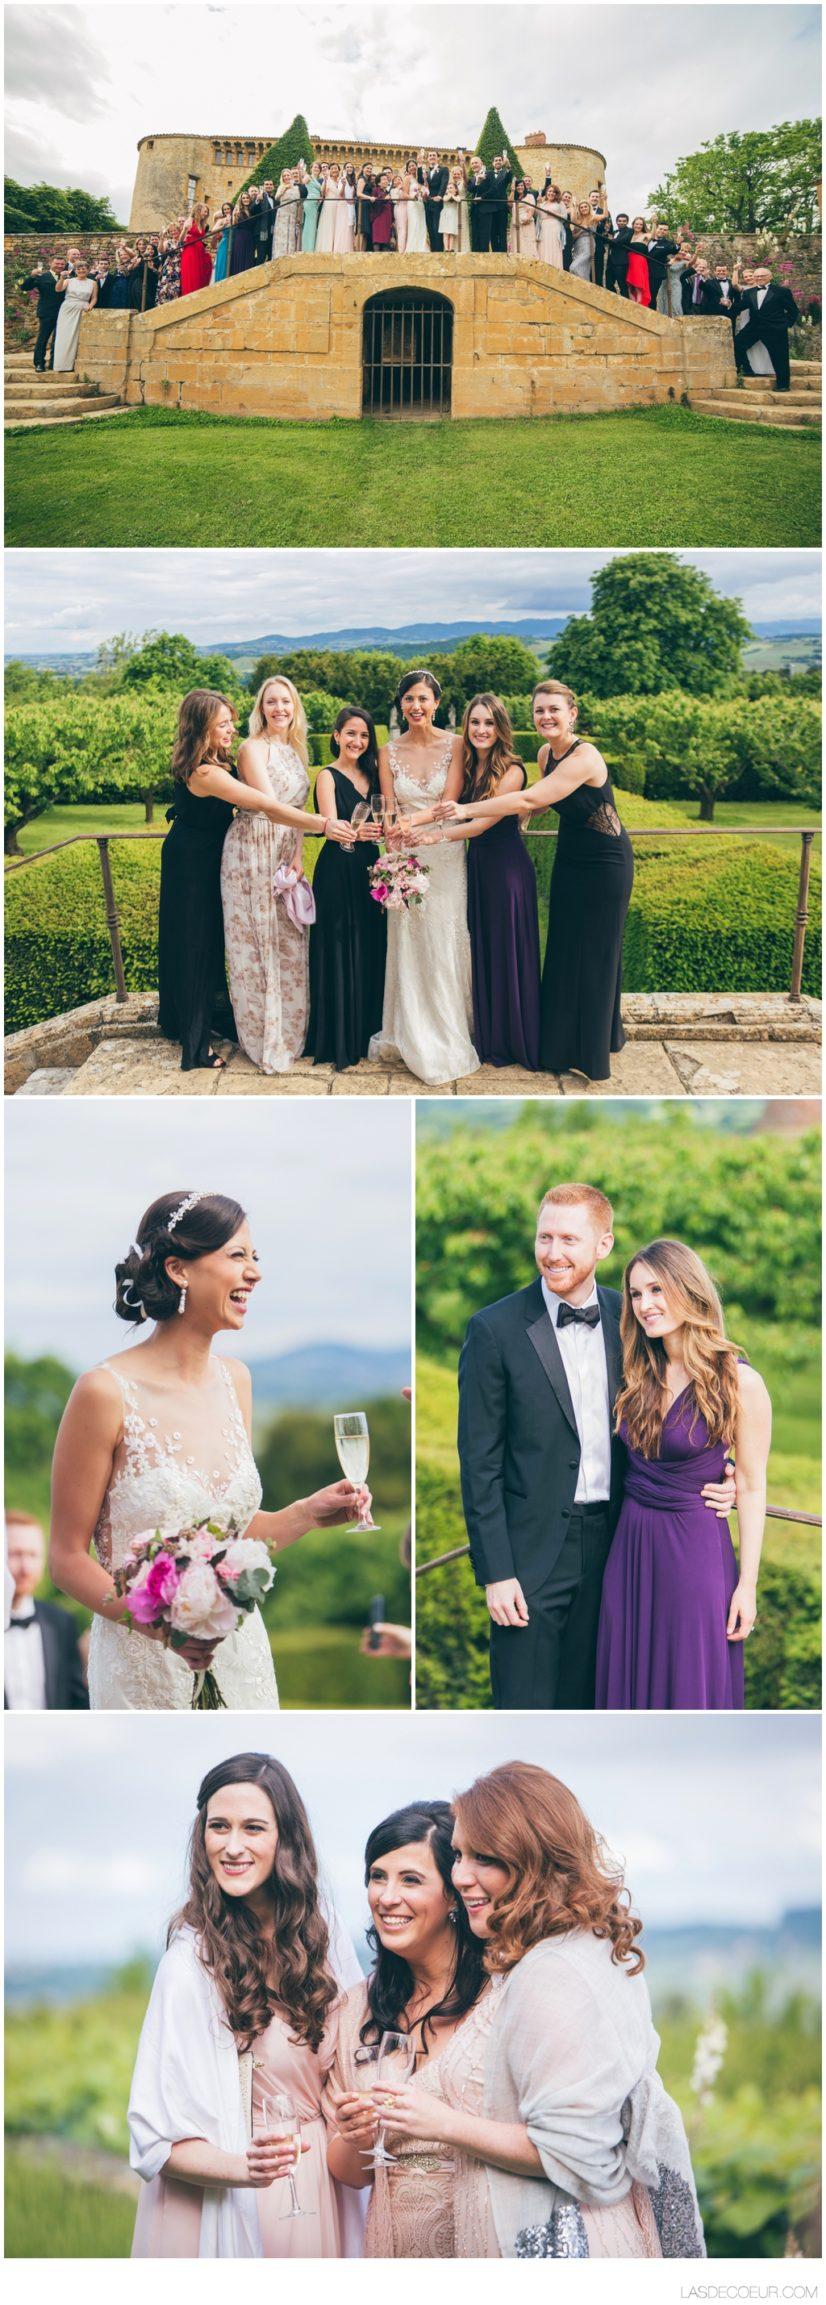 Photographe et vidéaste mariage Lyon photo groupe